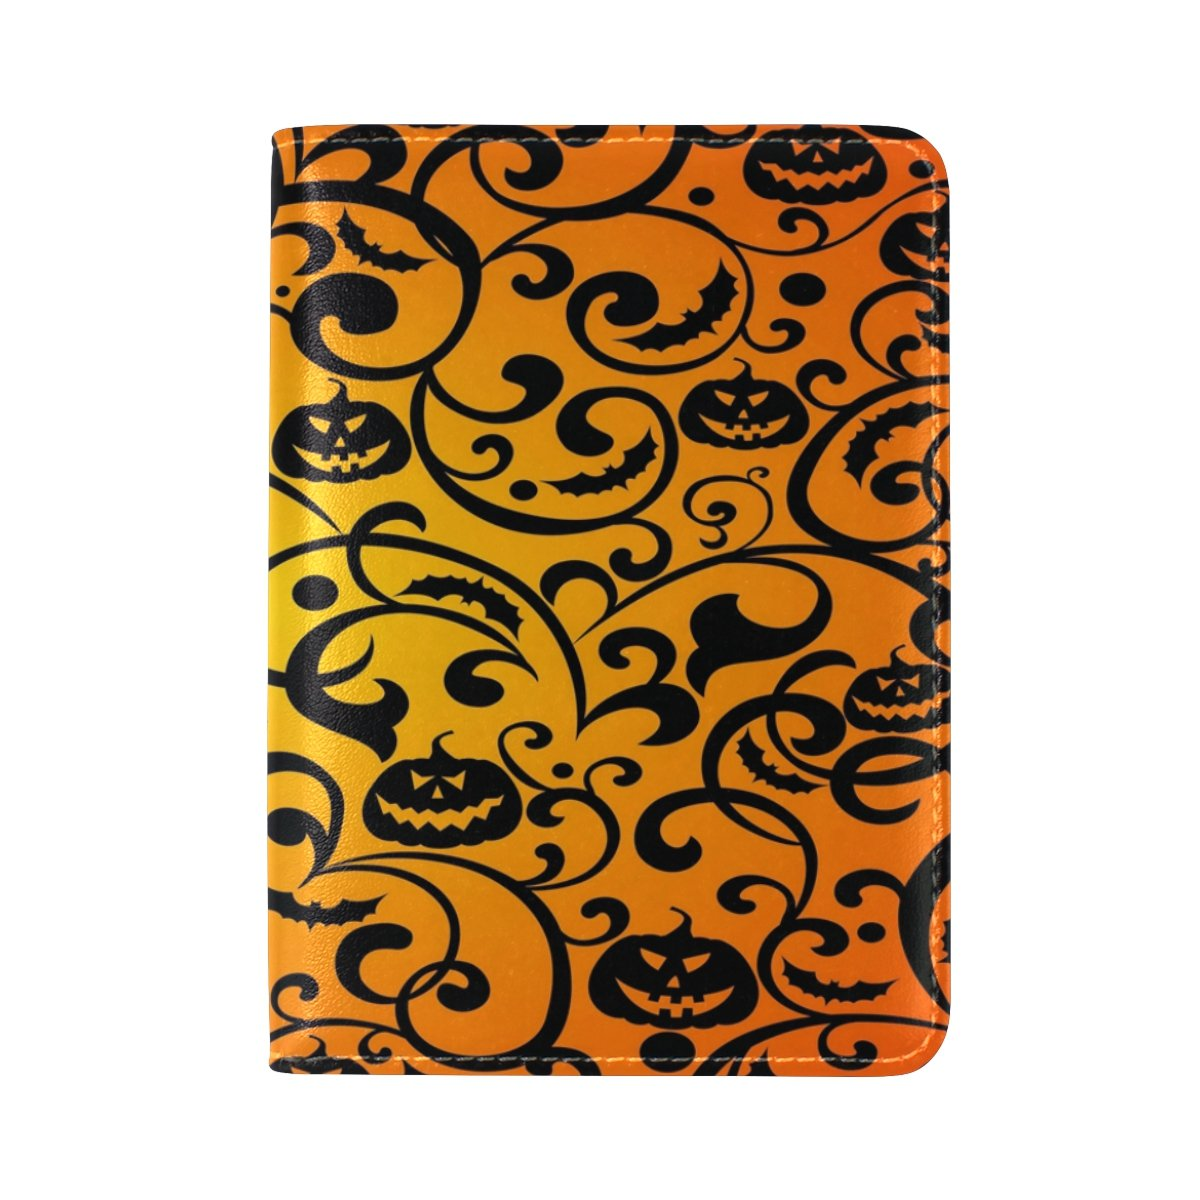 ALAZA Halloween Damask Pumpkin Leather Passport Holder Cover Case Travel One Pocket